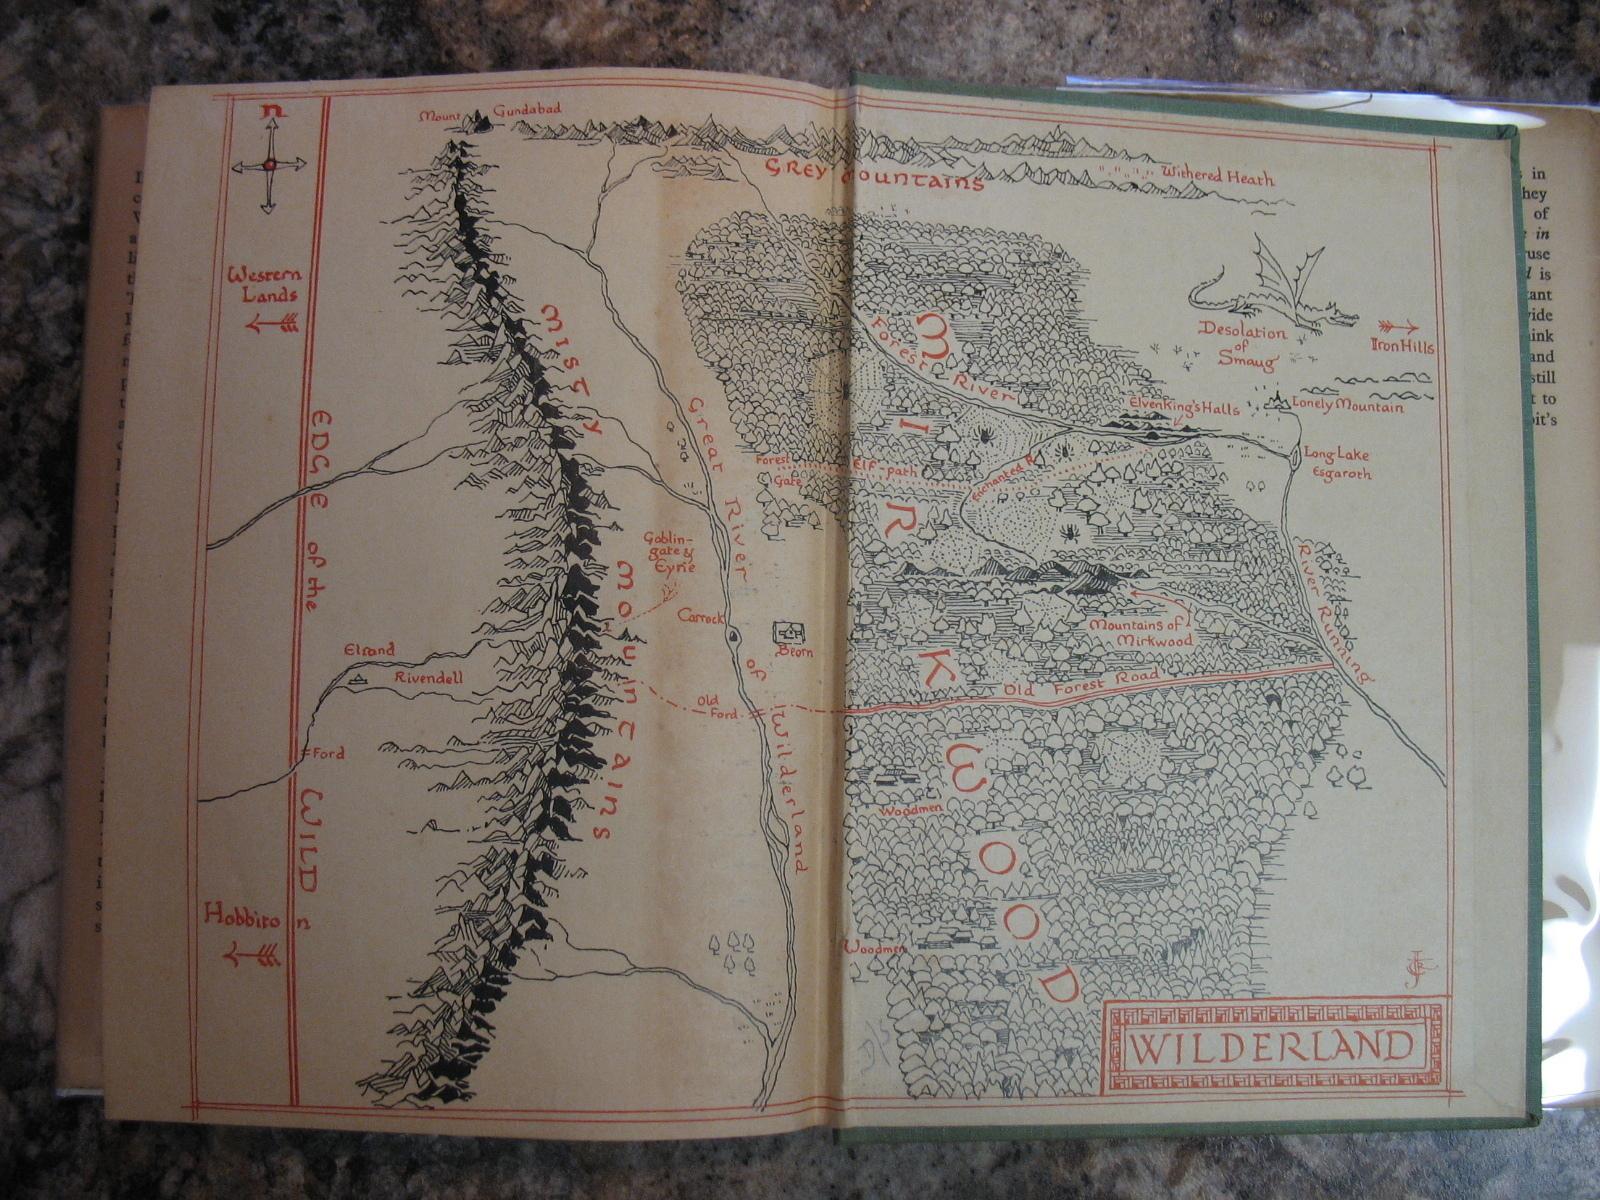 Hobbit Rare Books For Sale